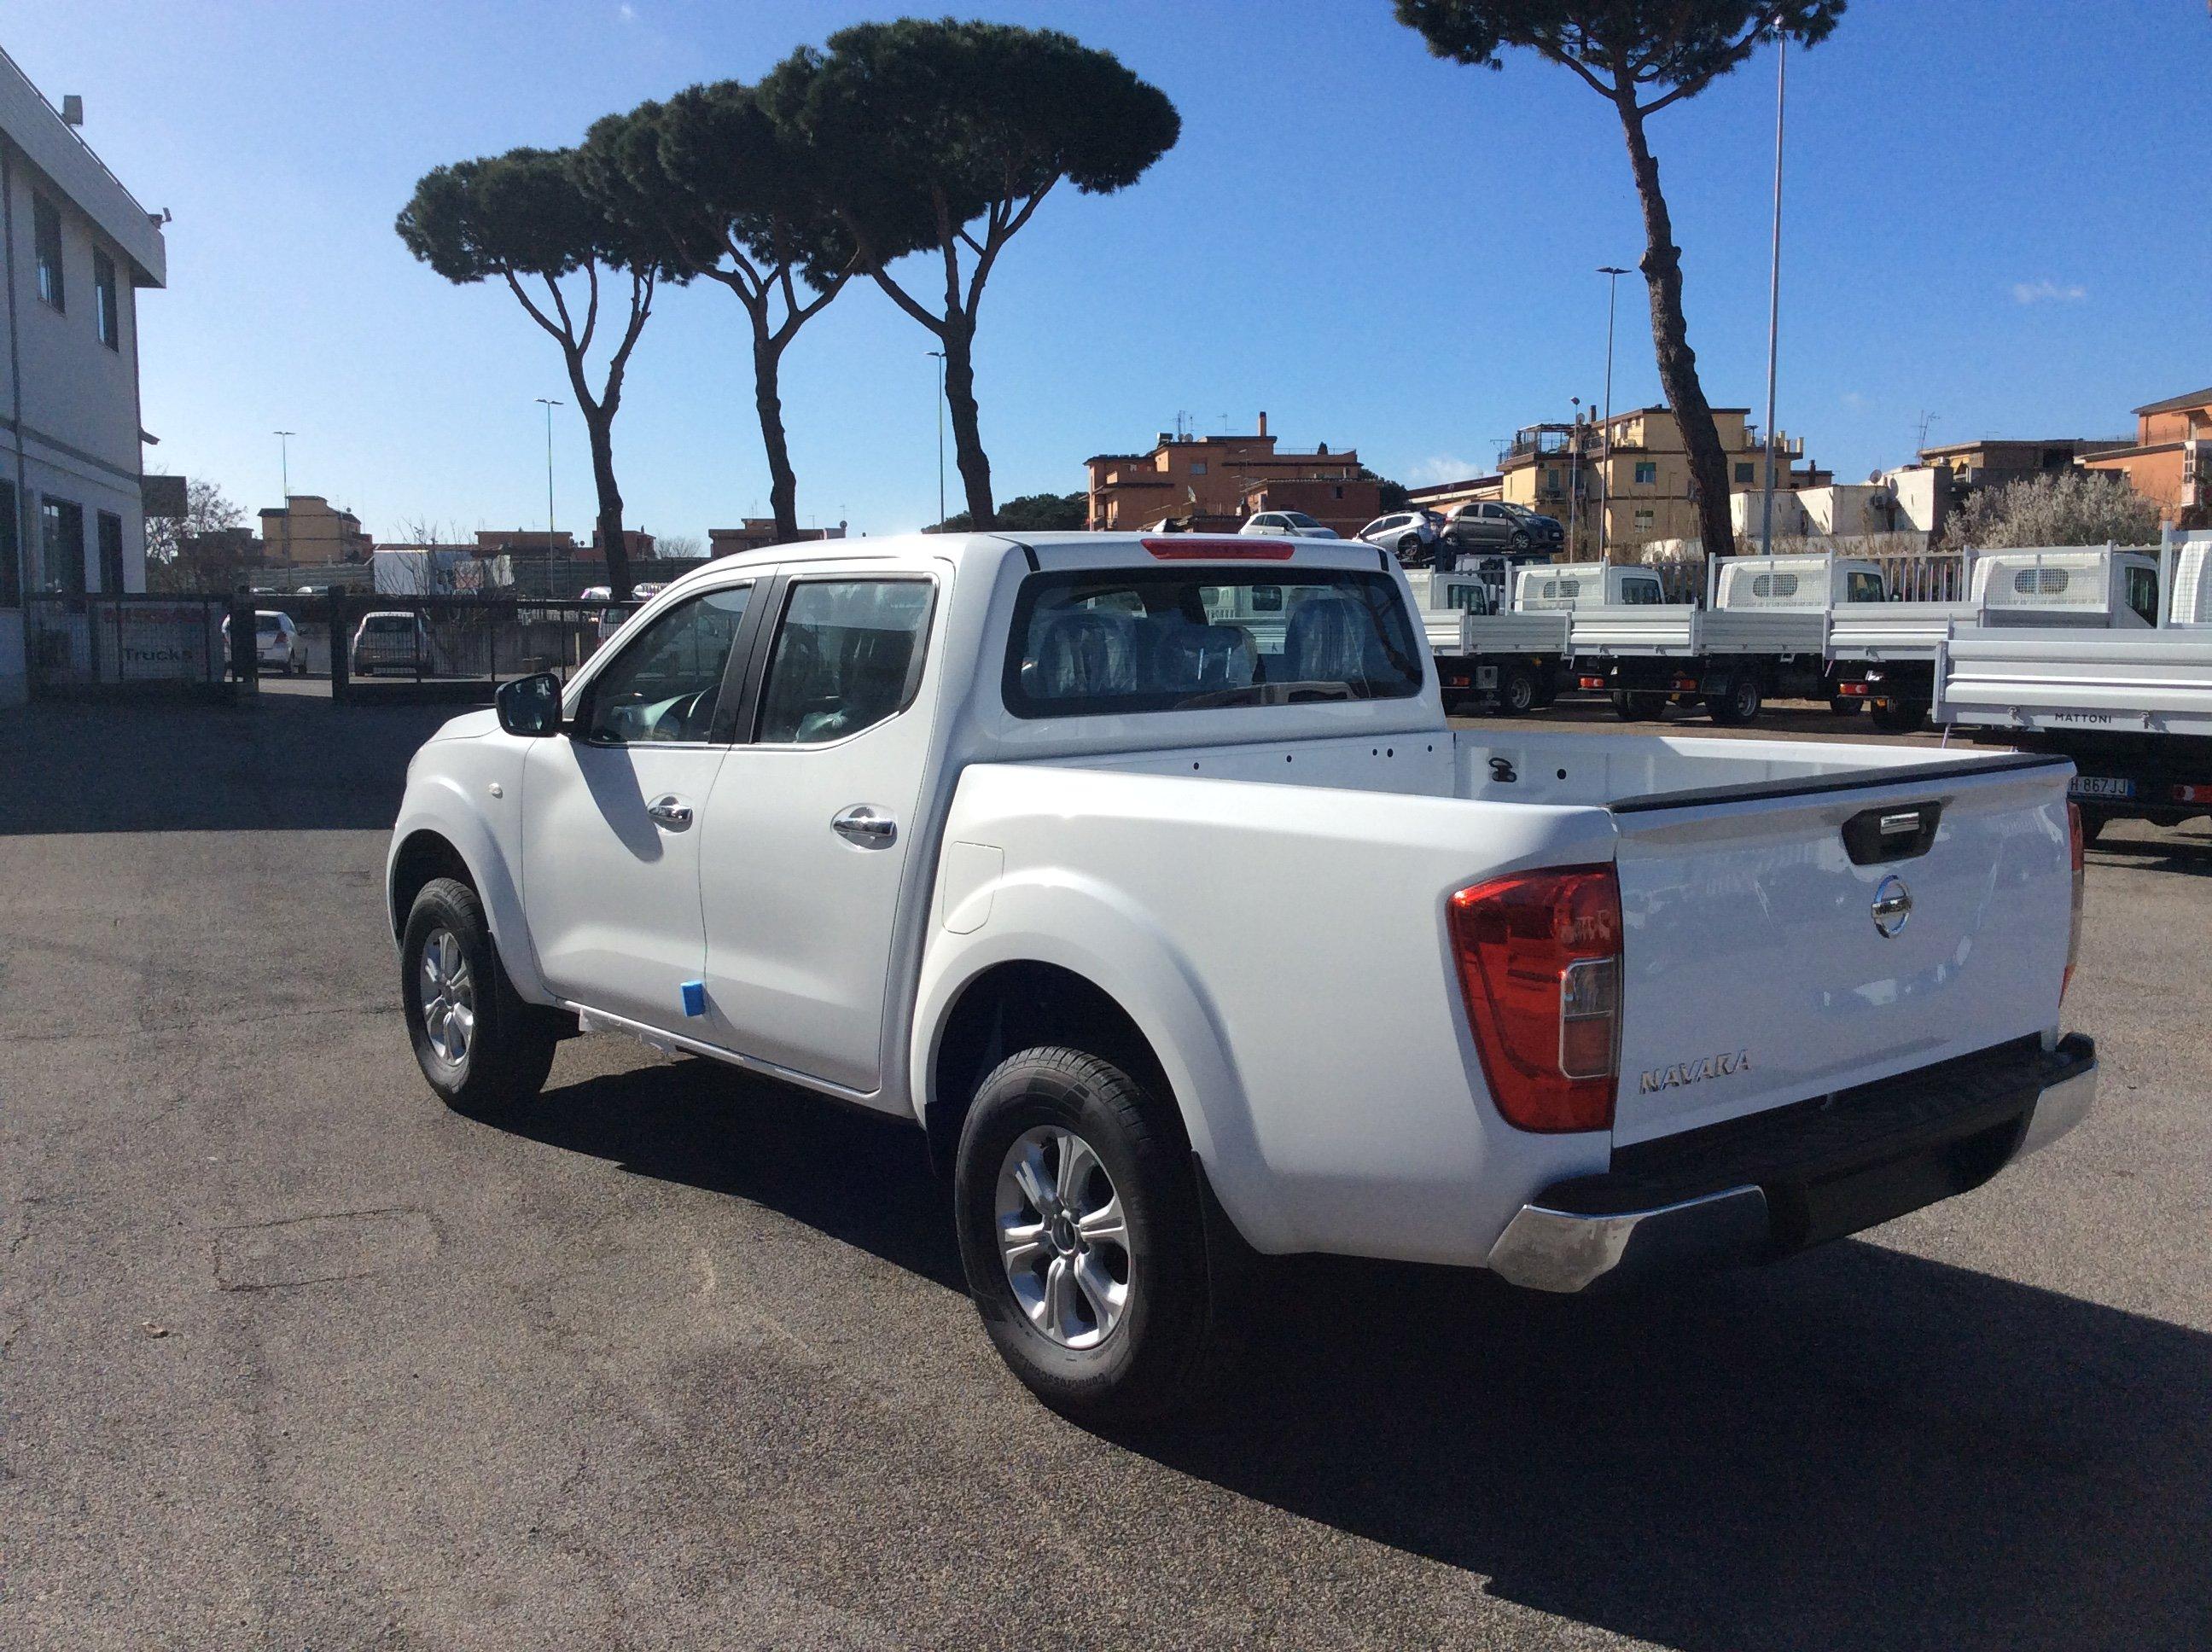 camion stile italiano